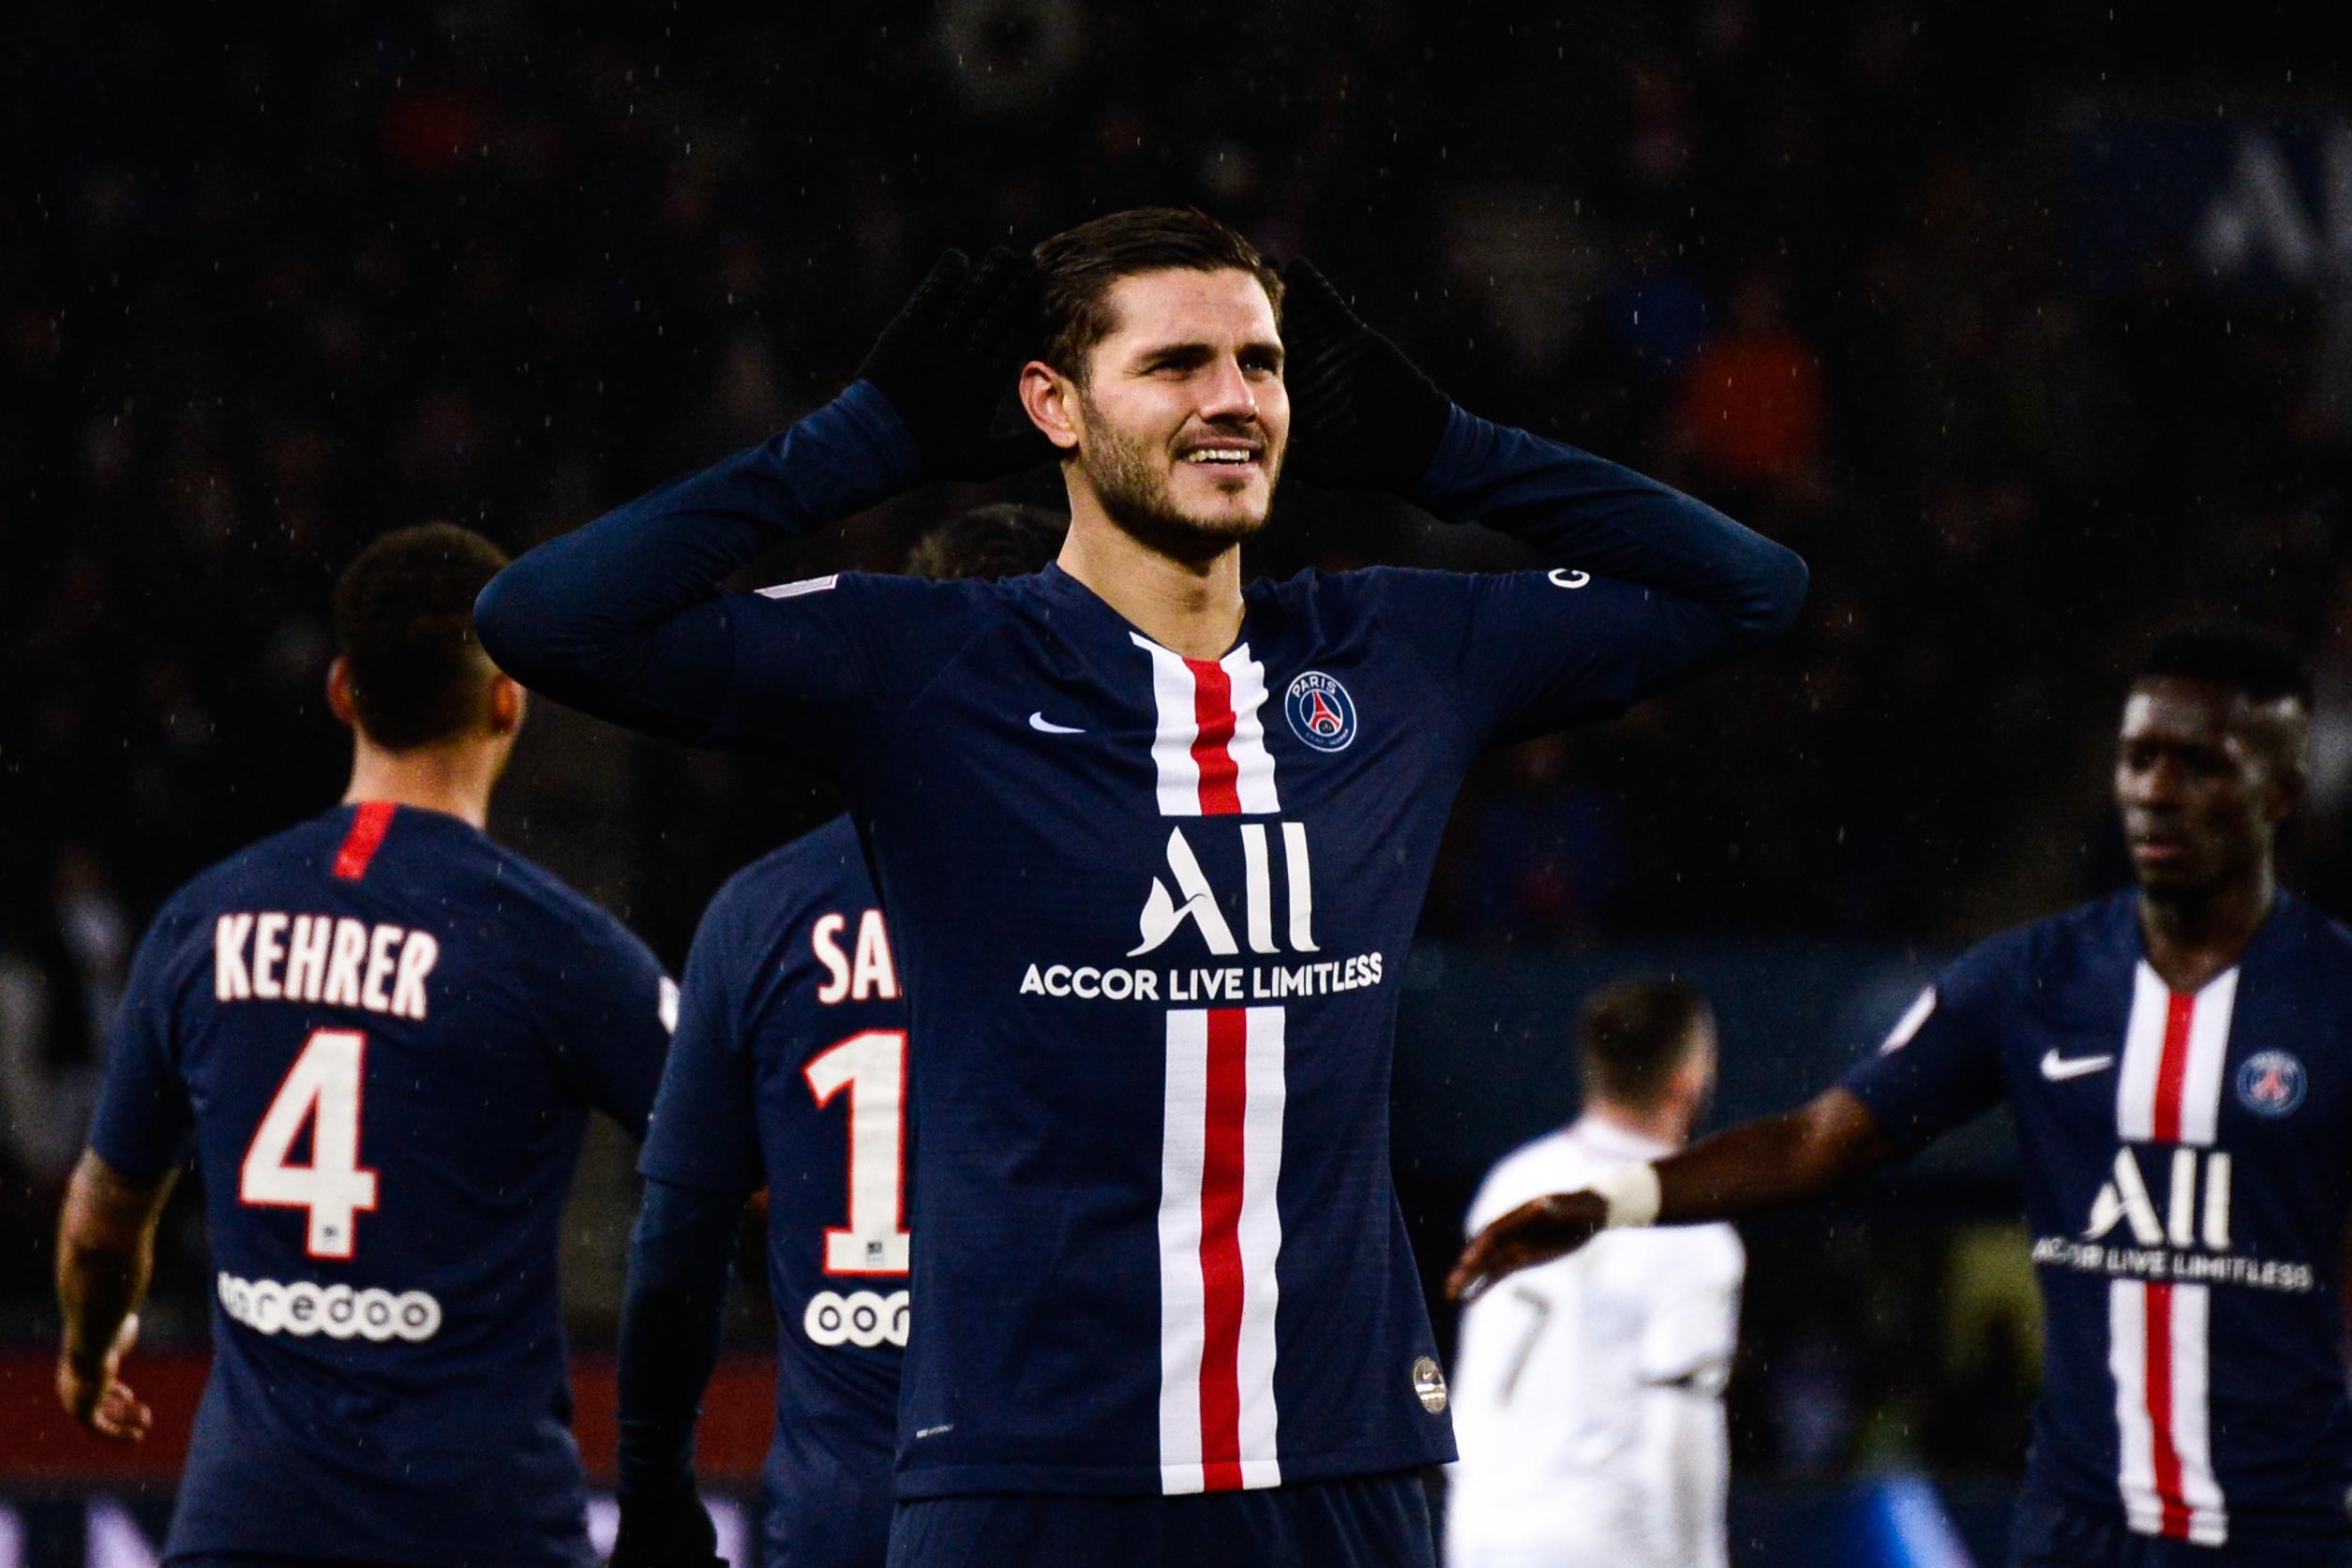 Football - Transferts - Le journal du mercato : Paris négocie pour Icardi